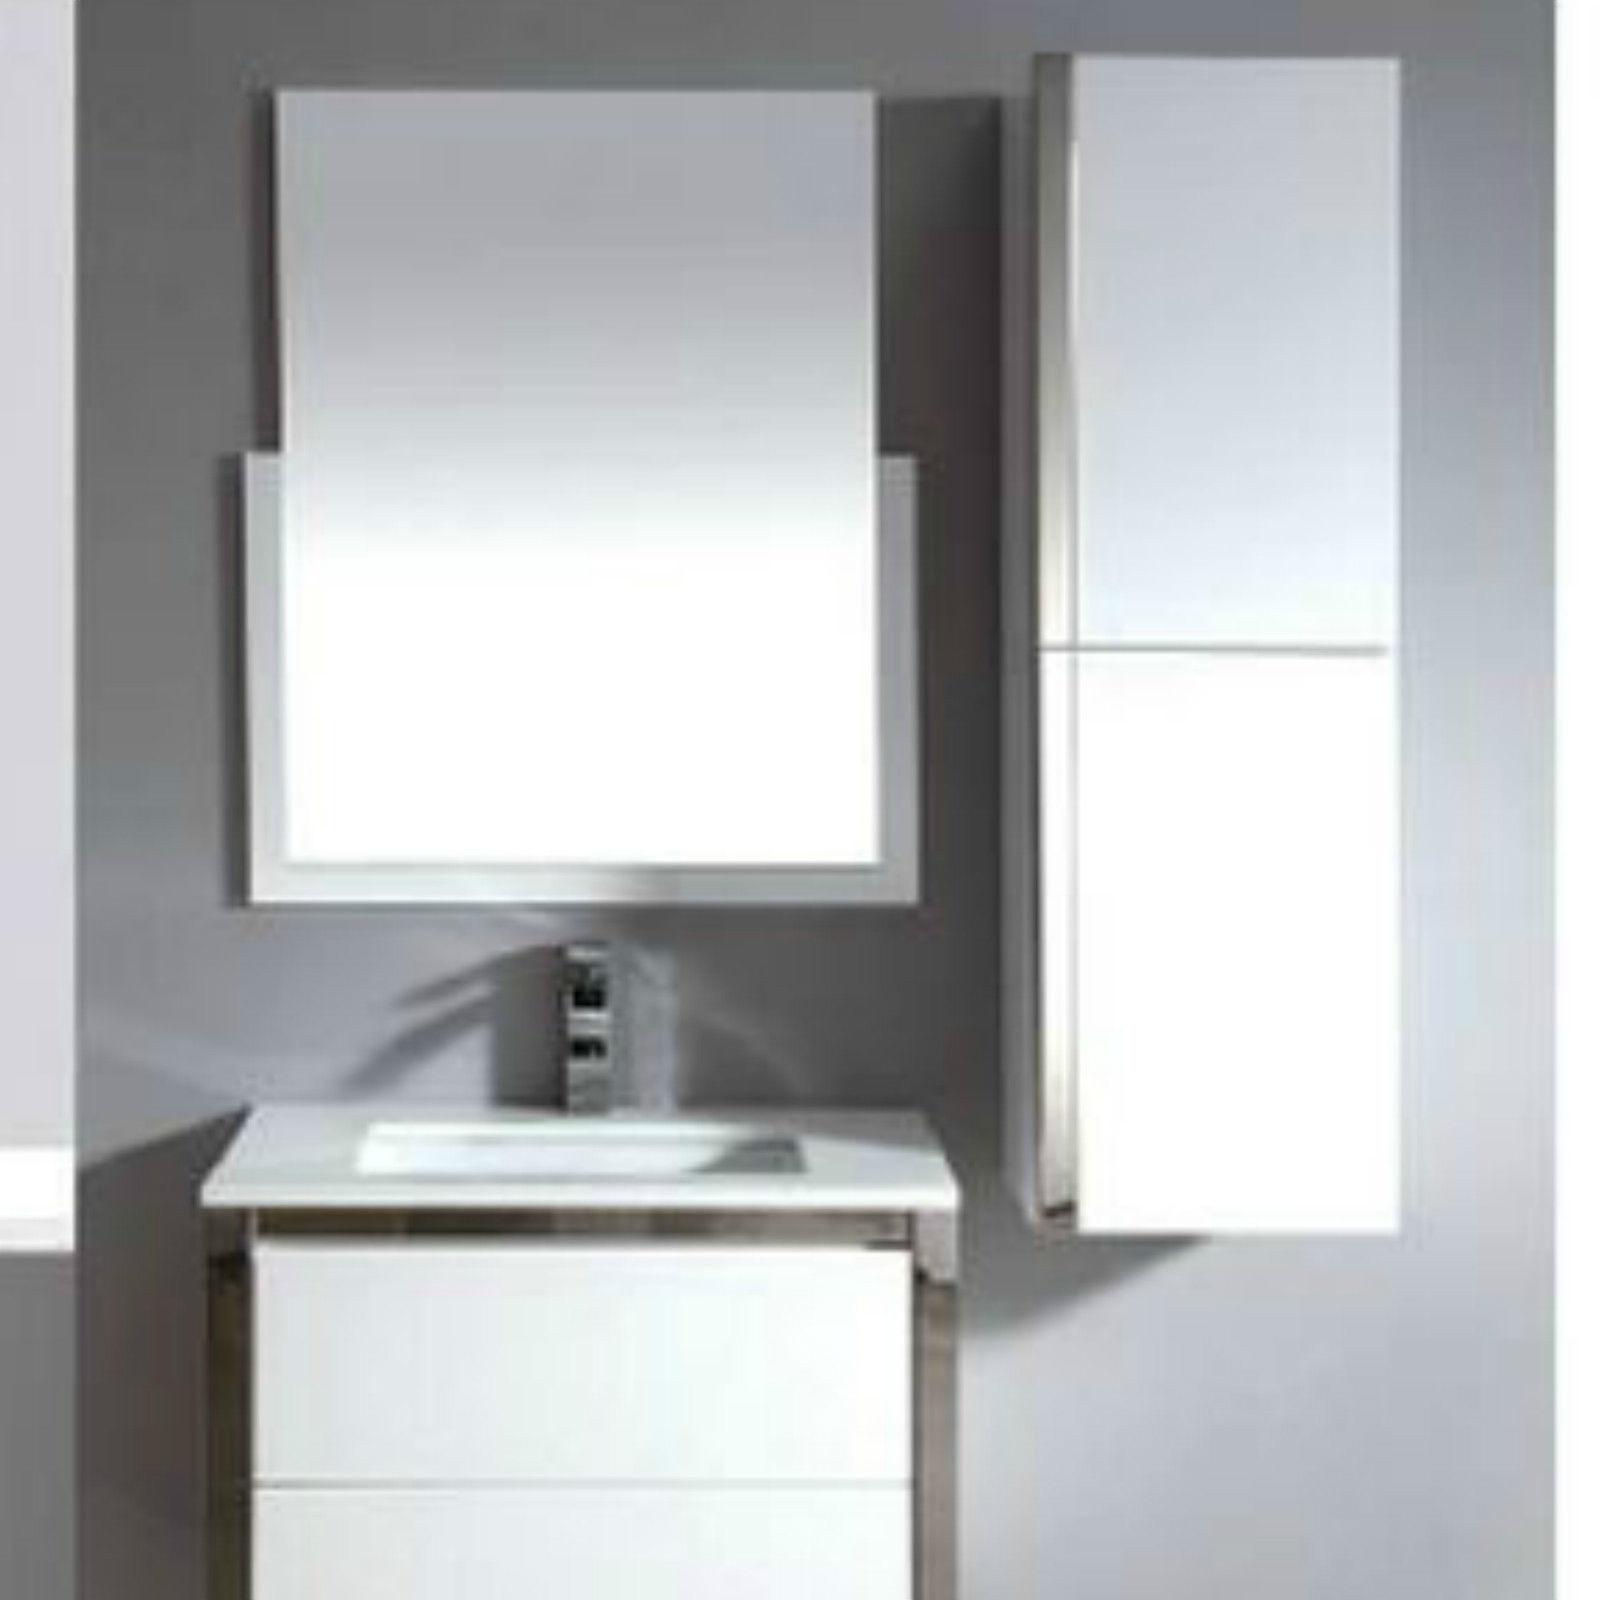 Unique Bathroom Vanity Hardware Chrome  Home Design Ideas